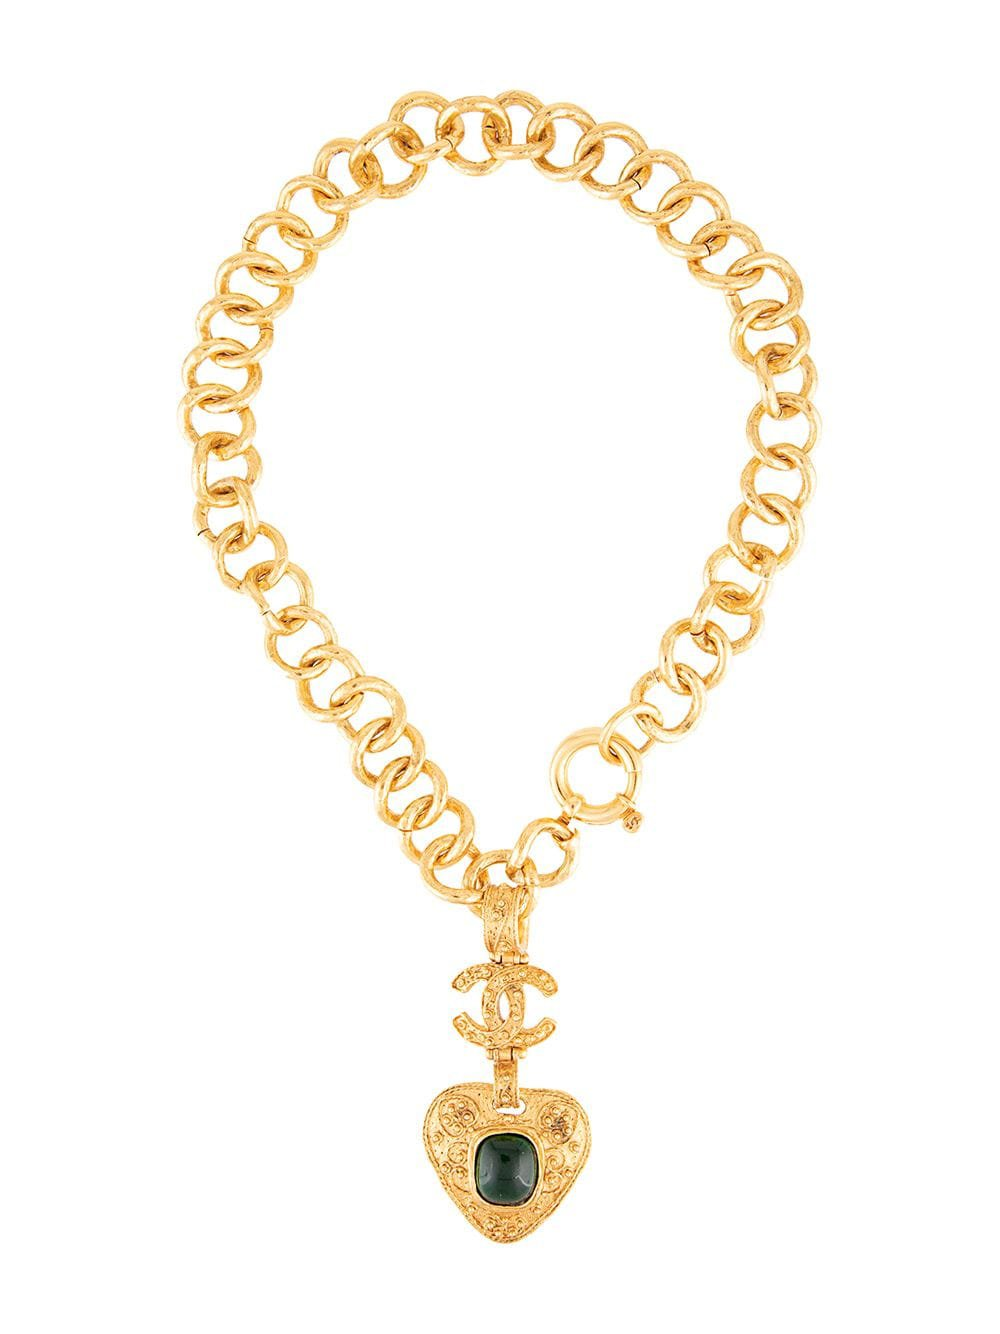 Chanel Vintage Triangle Gripoix Necklace - Farfetch